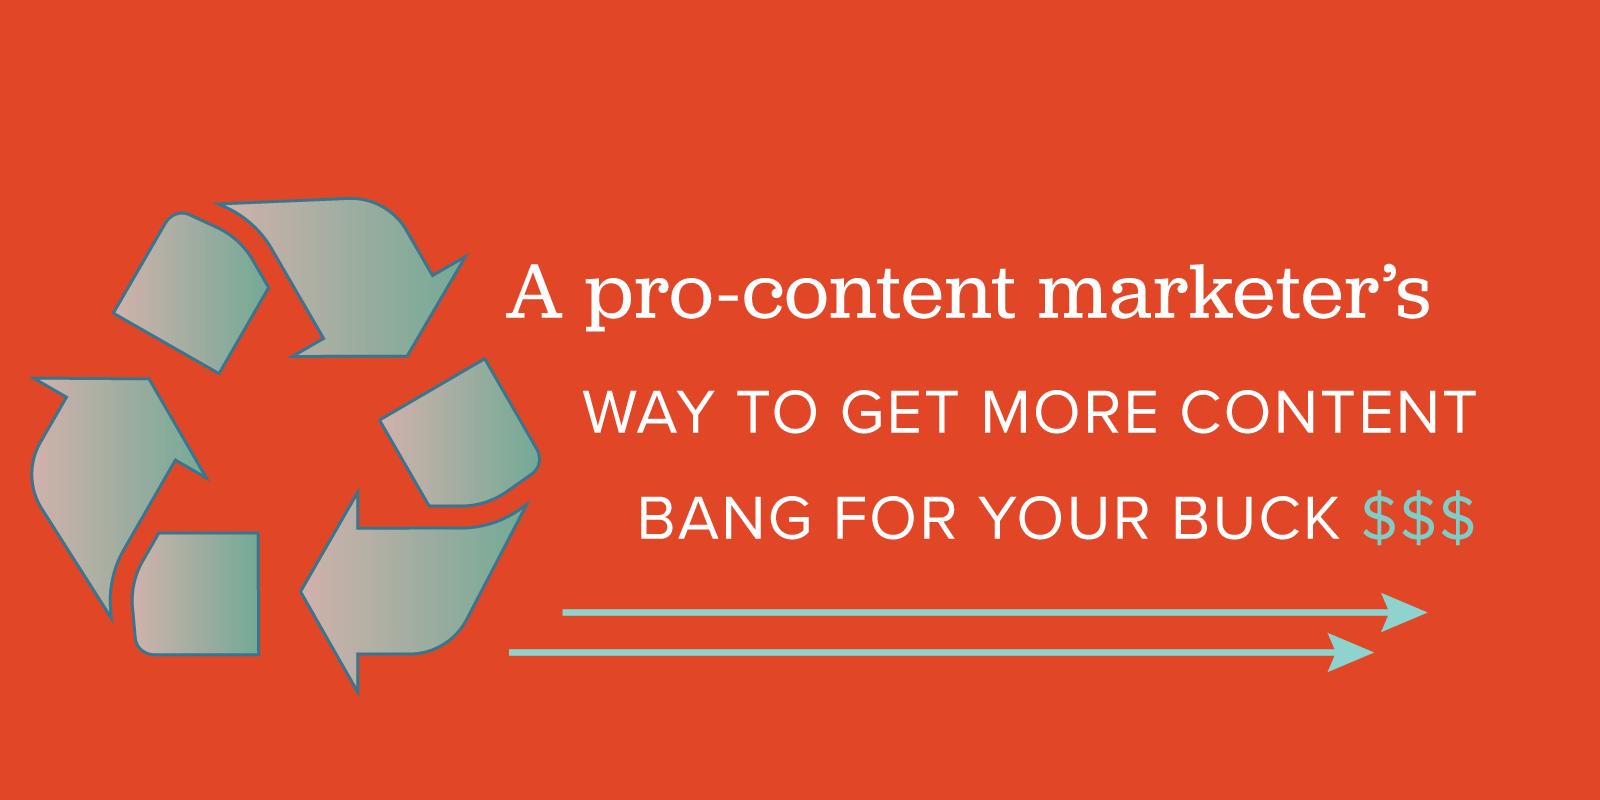 content-marketing-budget-saving-tips-1